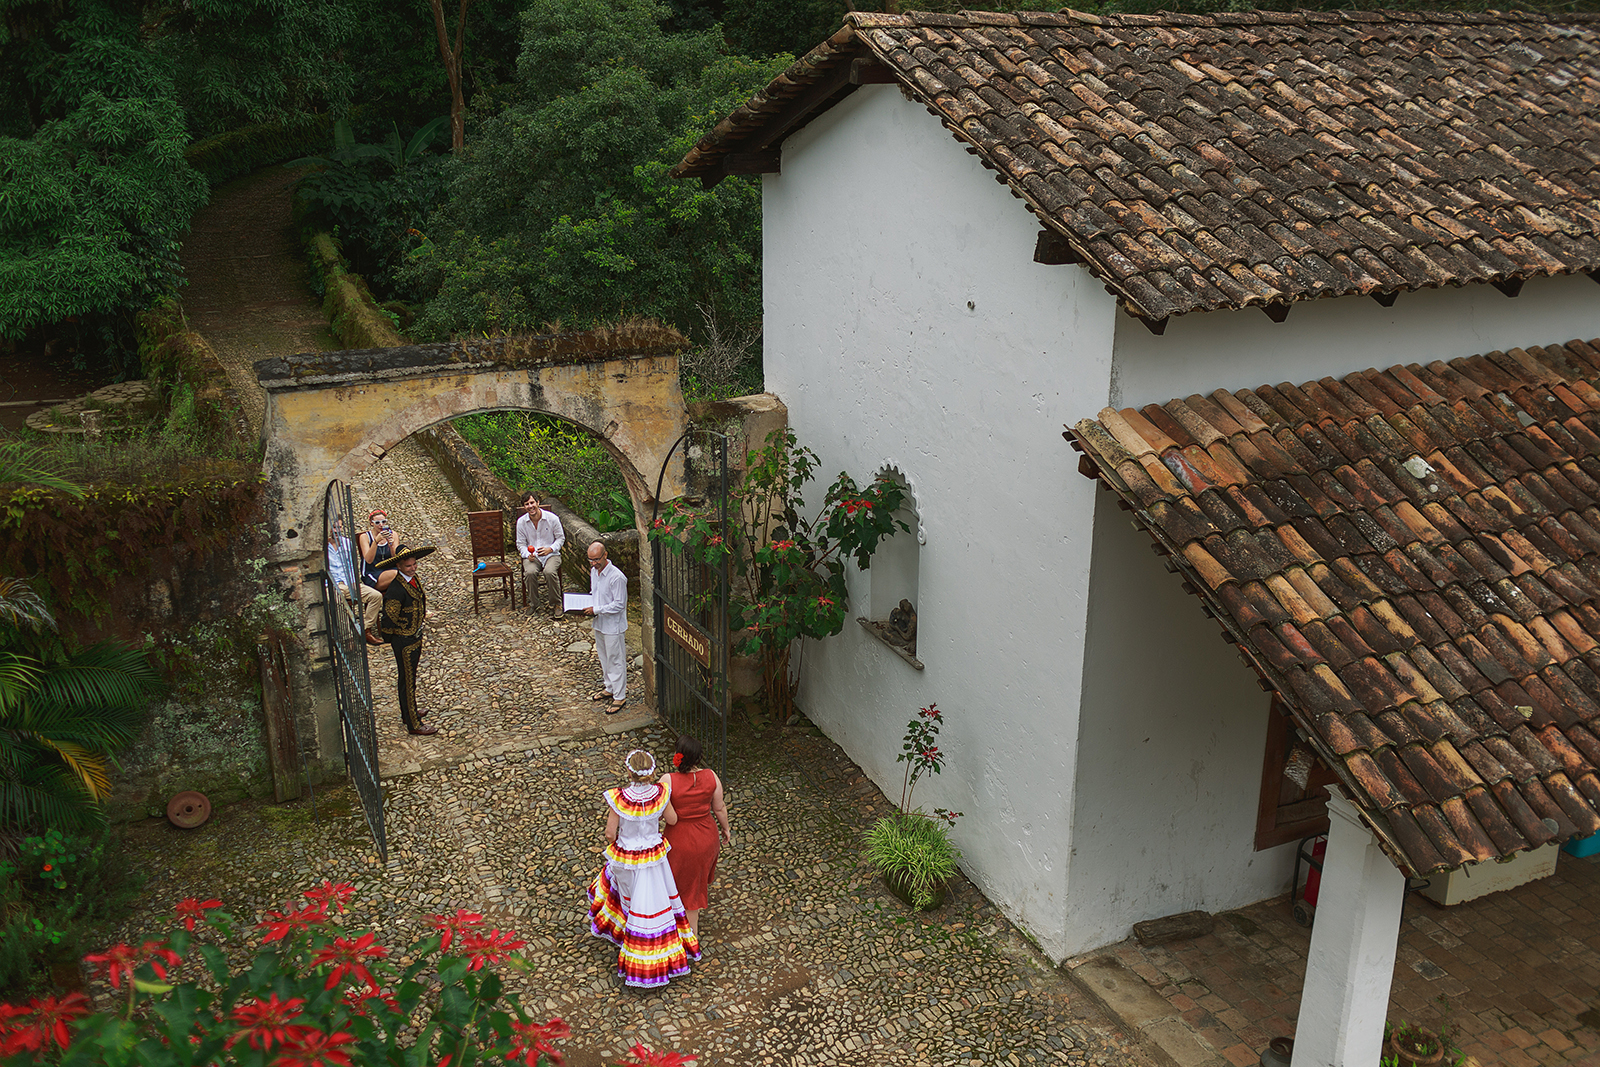 hacienda-jalisco-view-arch